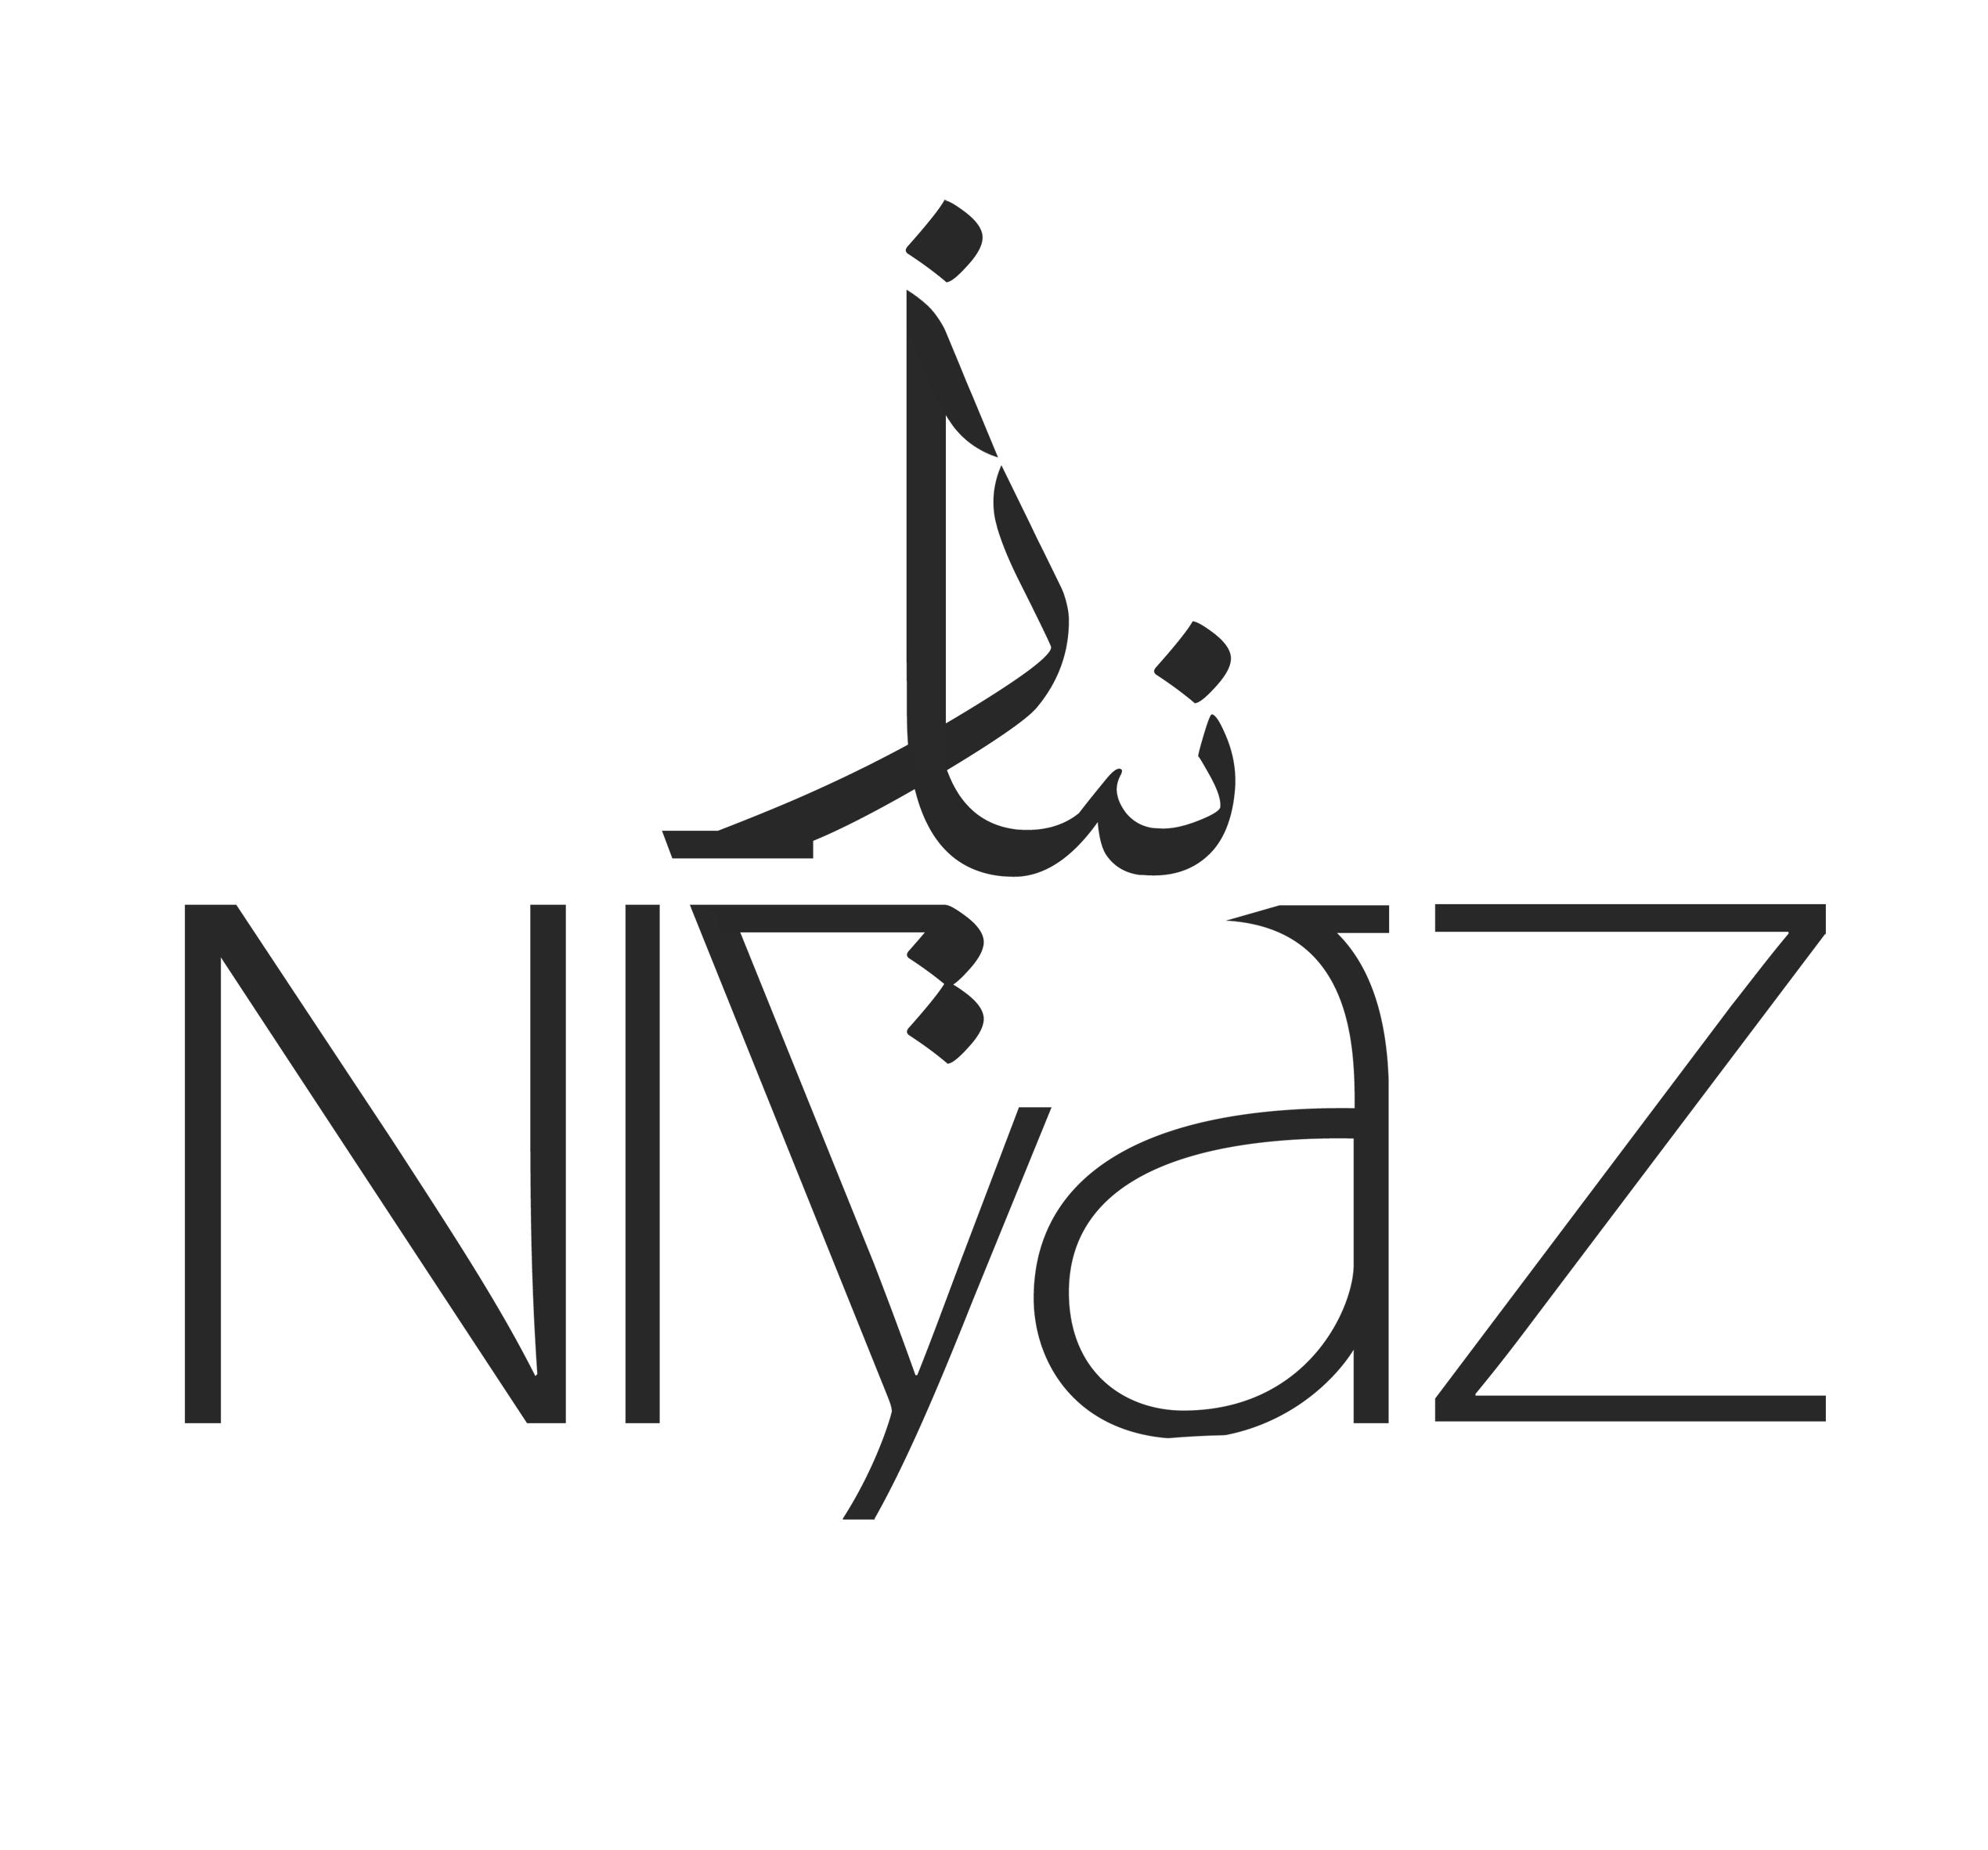 Niyaz - Logos